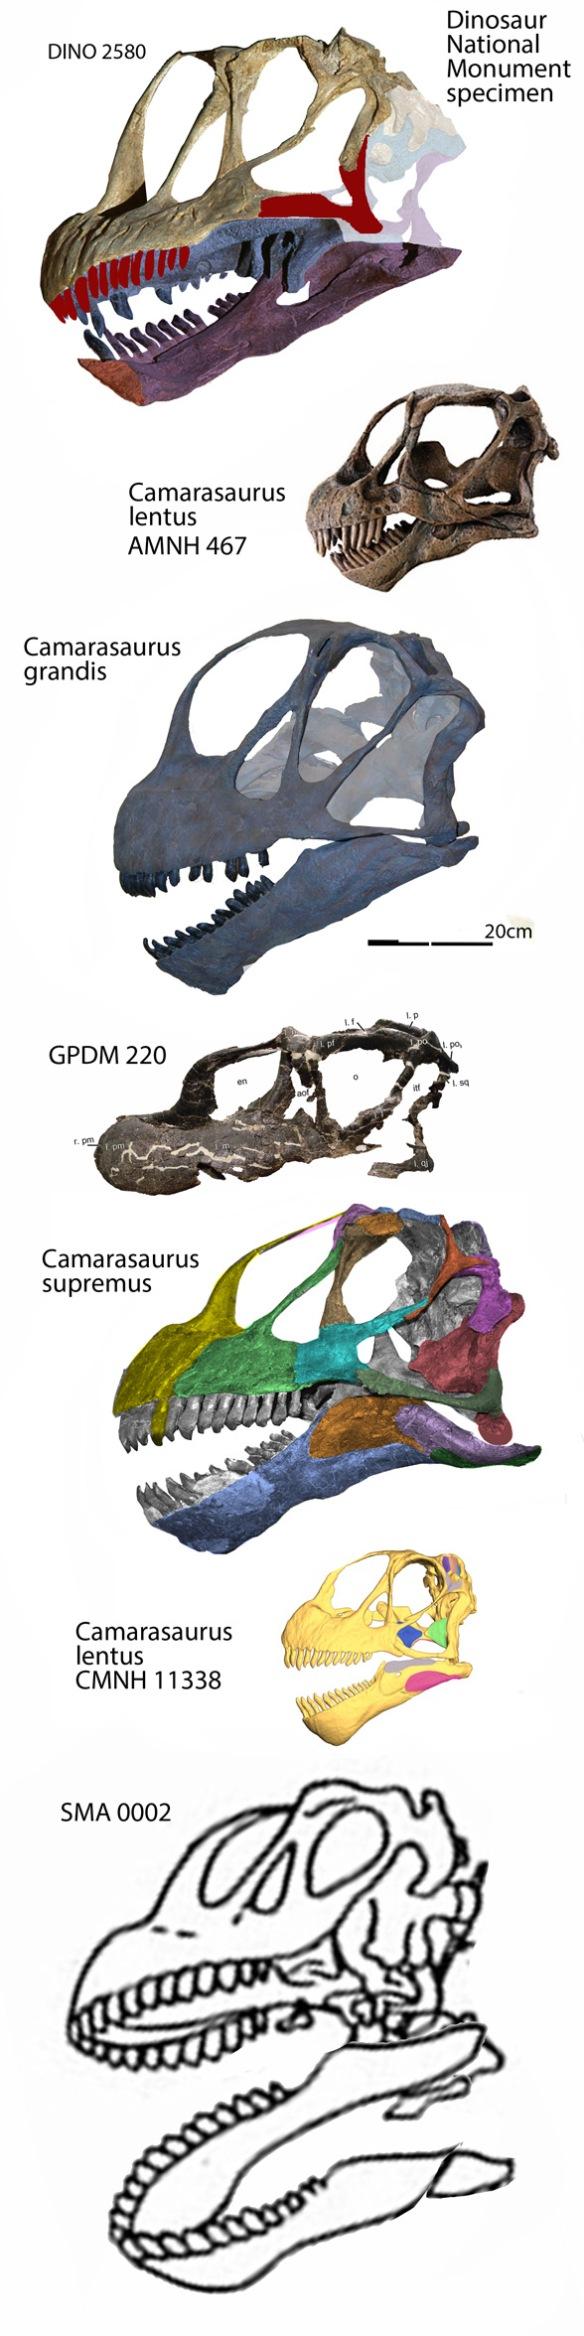 Figure 3. Several skulls attributed to Camarasaurus to scale. SMA 0002 is the short-limbed Cathetosaurus. Brachiosaurus appears to be a derived camarasaur.